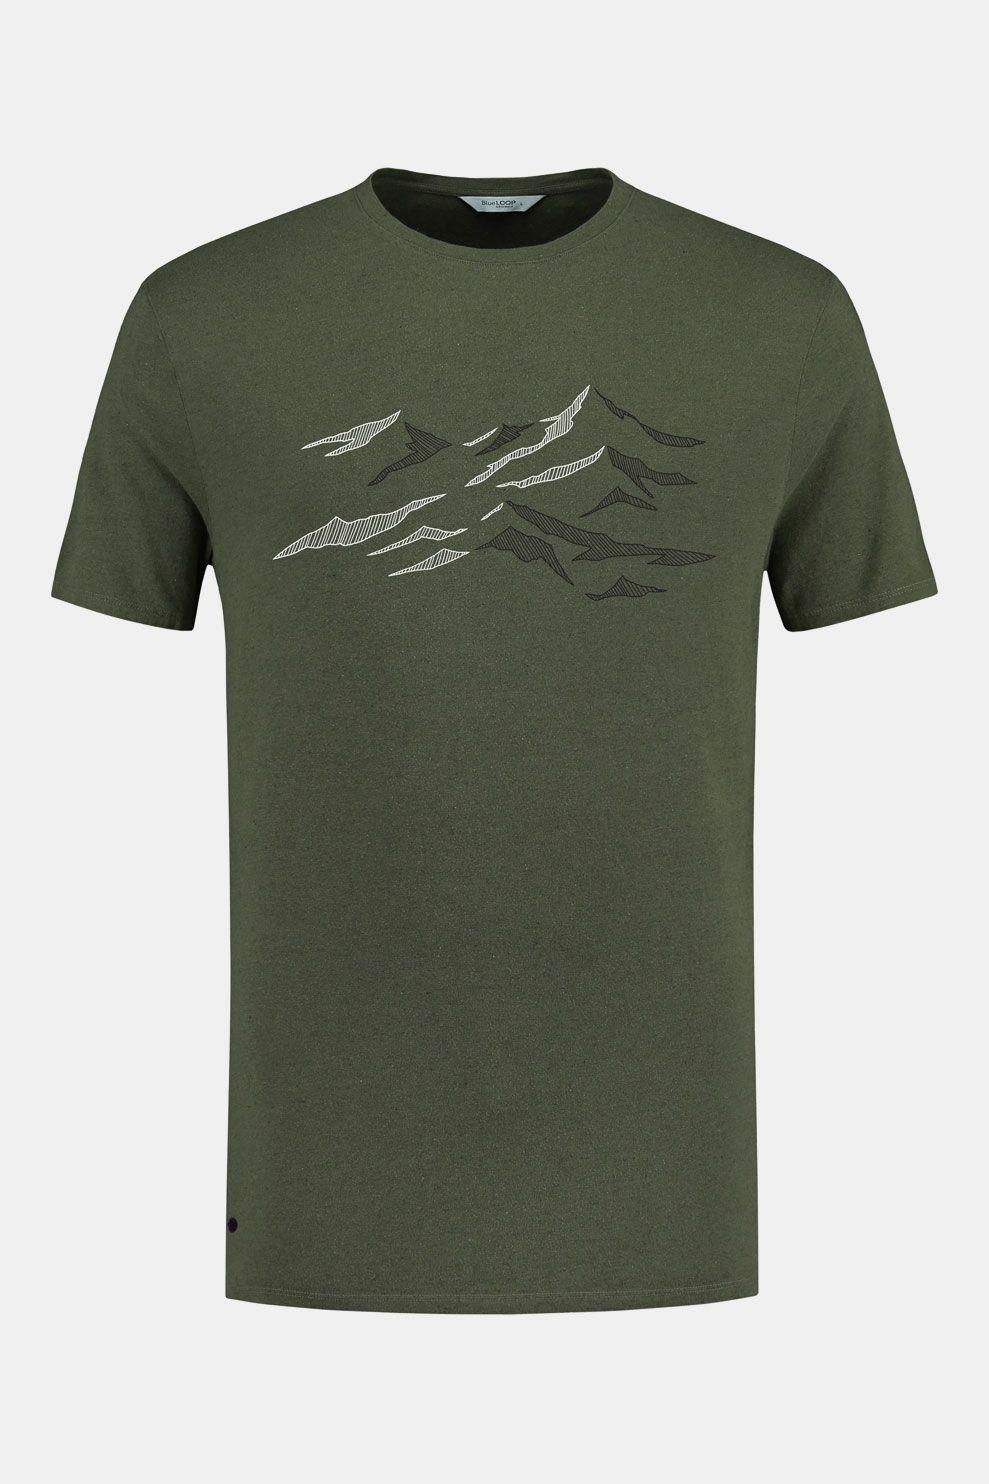 Blue Loop Originals Pure Slopes Shirt Donkergroen